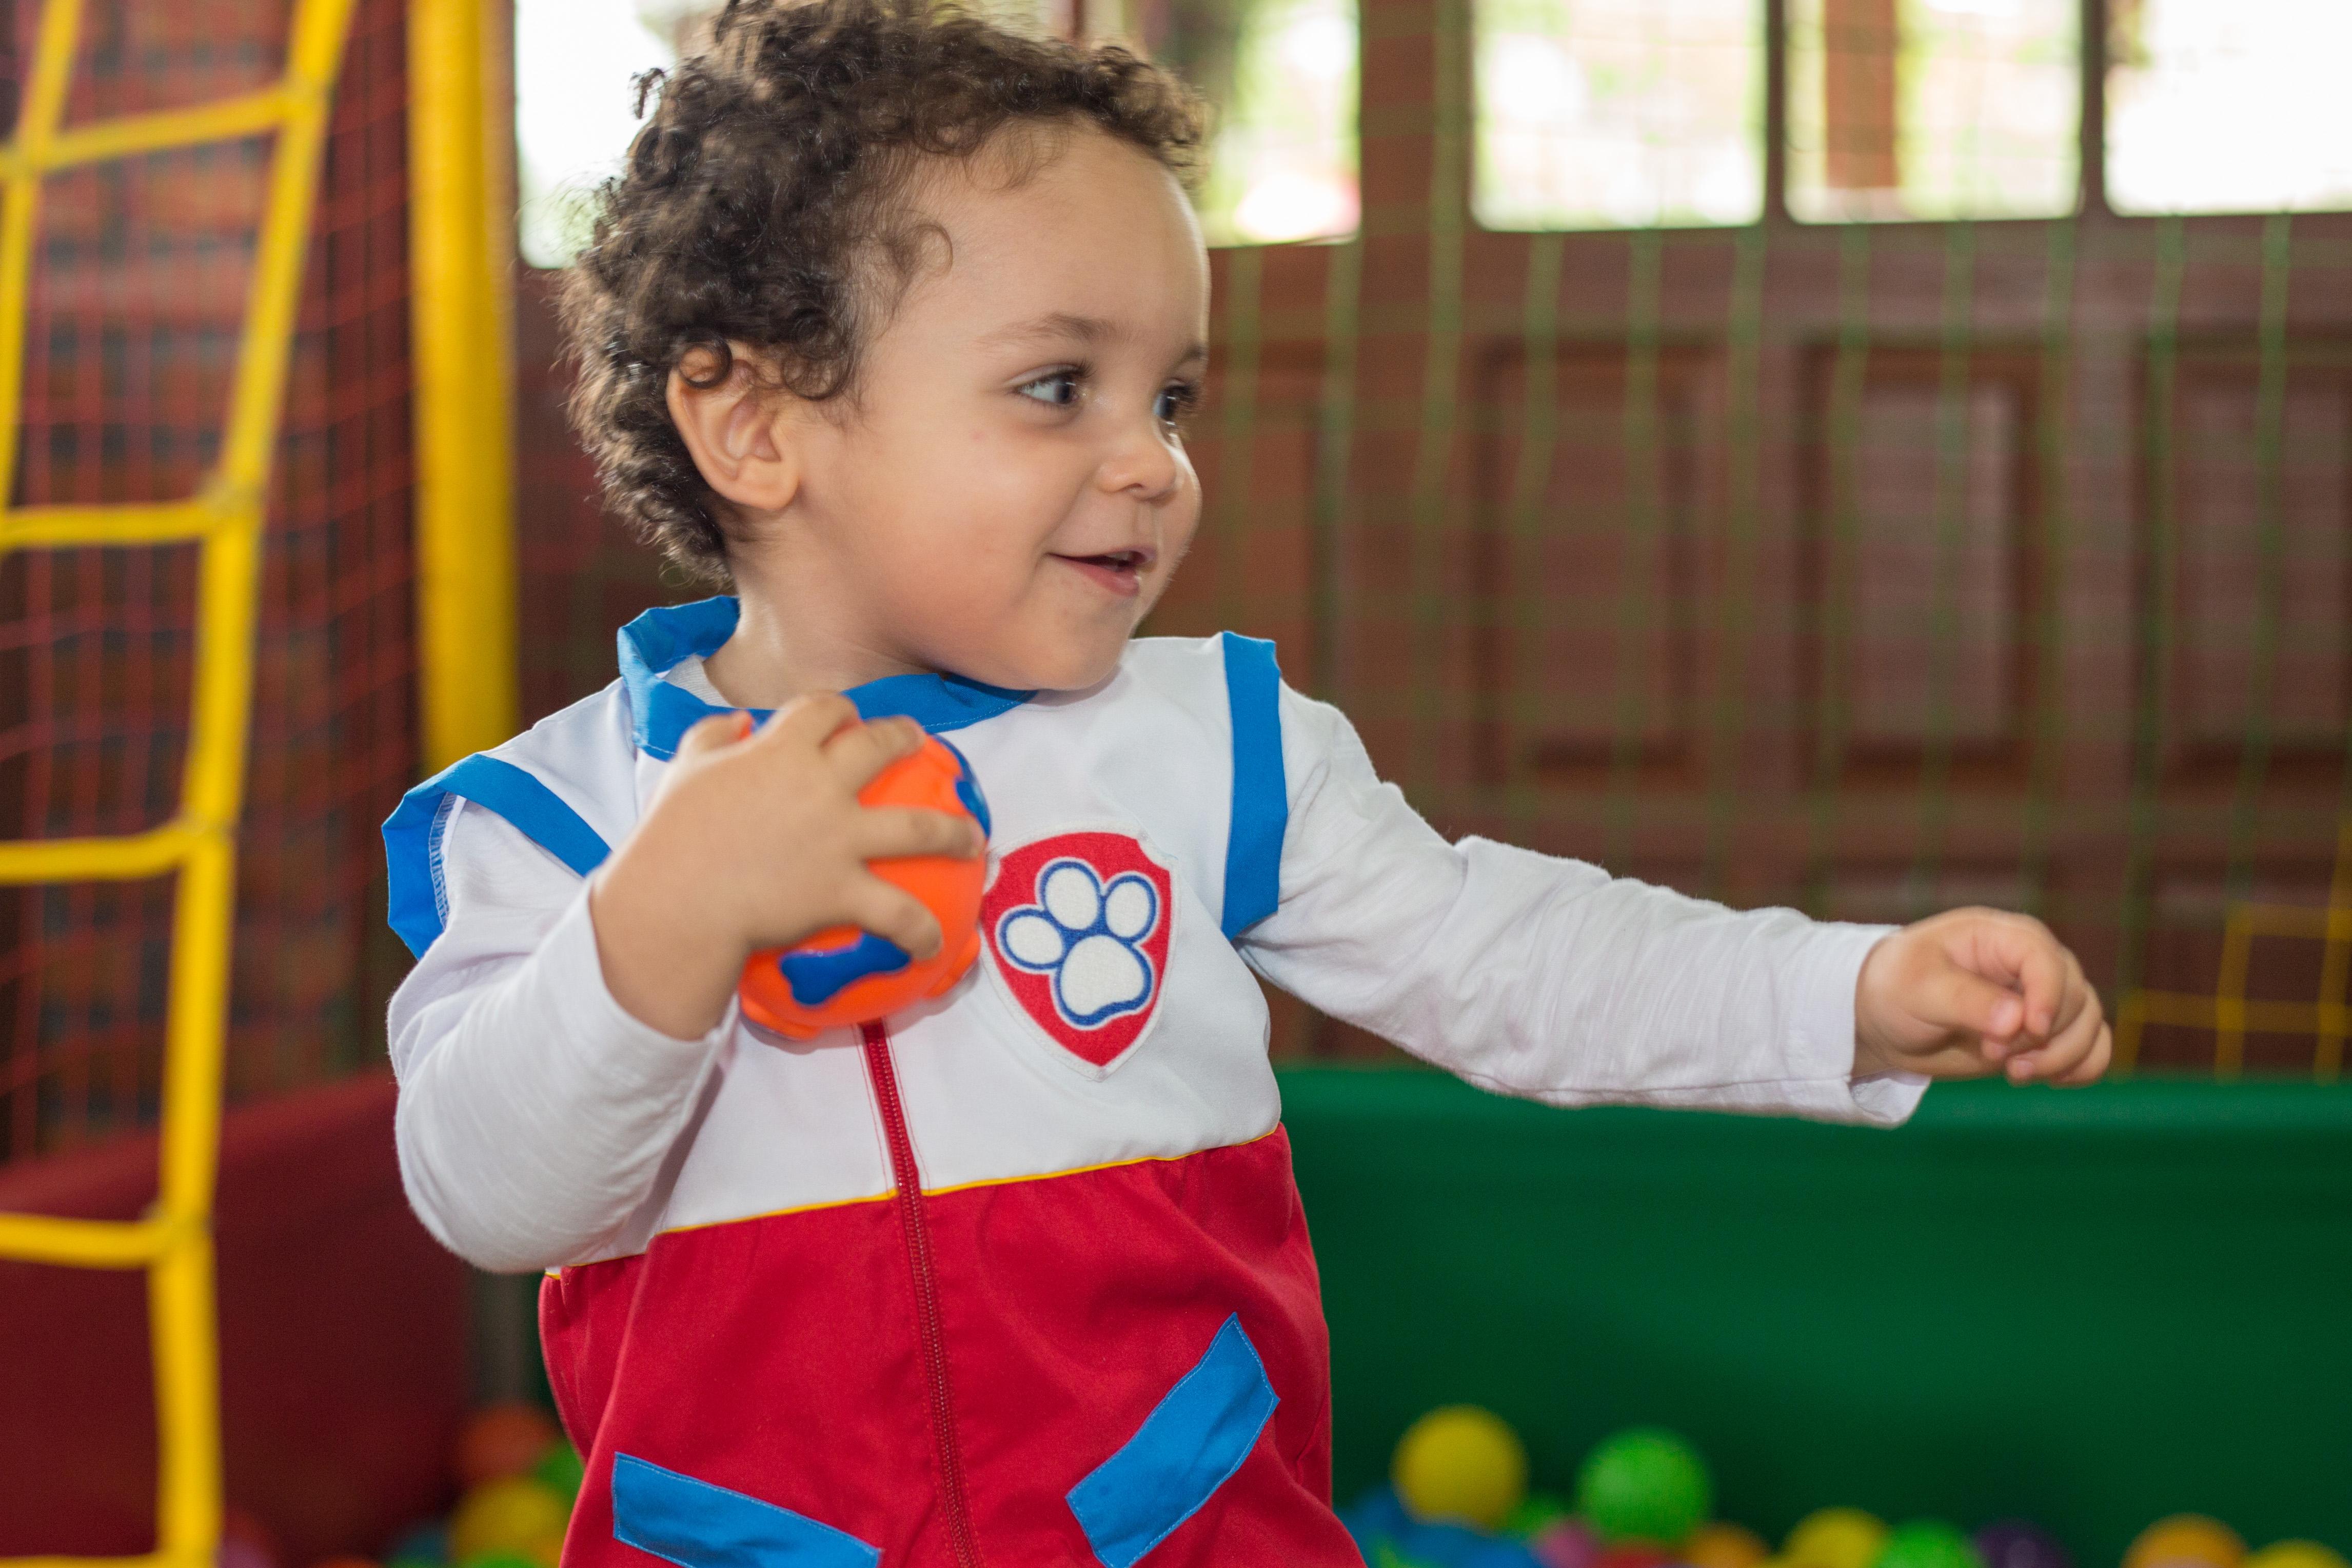 Festa‐Infantil‐Florianopolis‐Ana‐Marmo‐FotografiaFesta‐Infantil‐Florianopolis‐Ana‐Marmo‐Fotografia191A0251